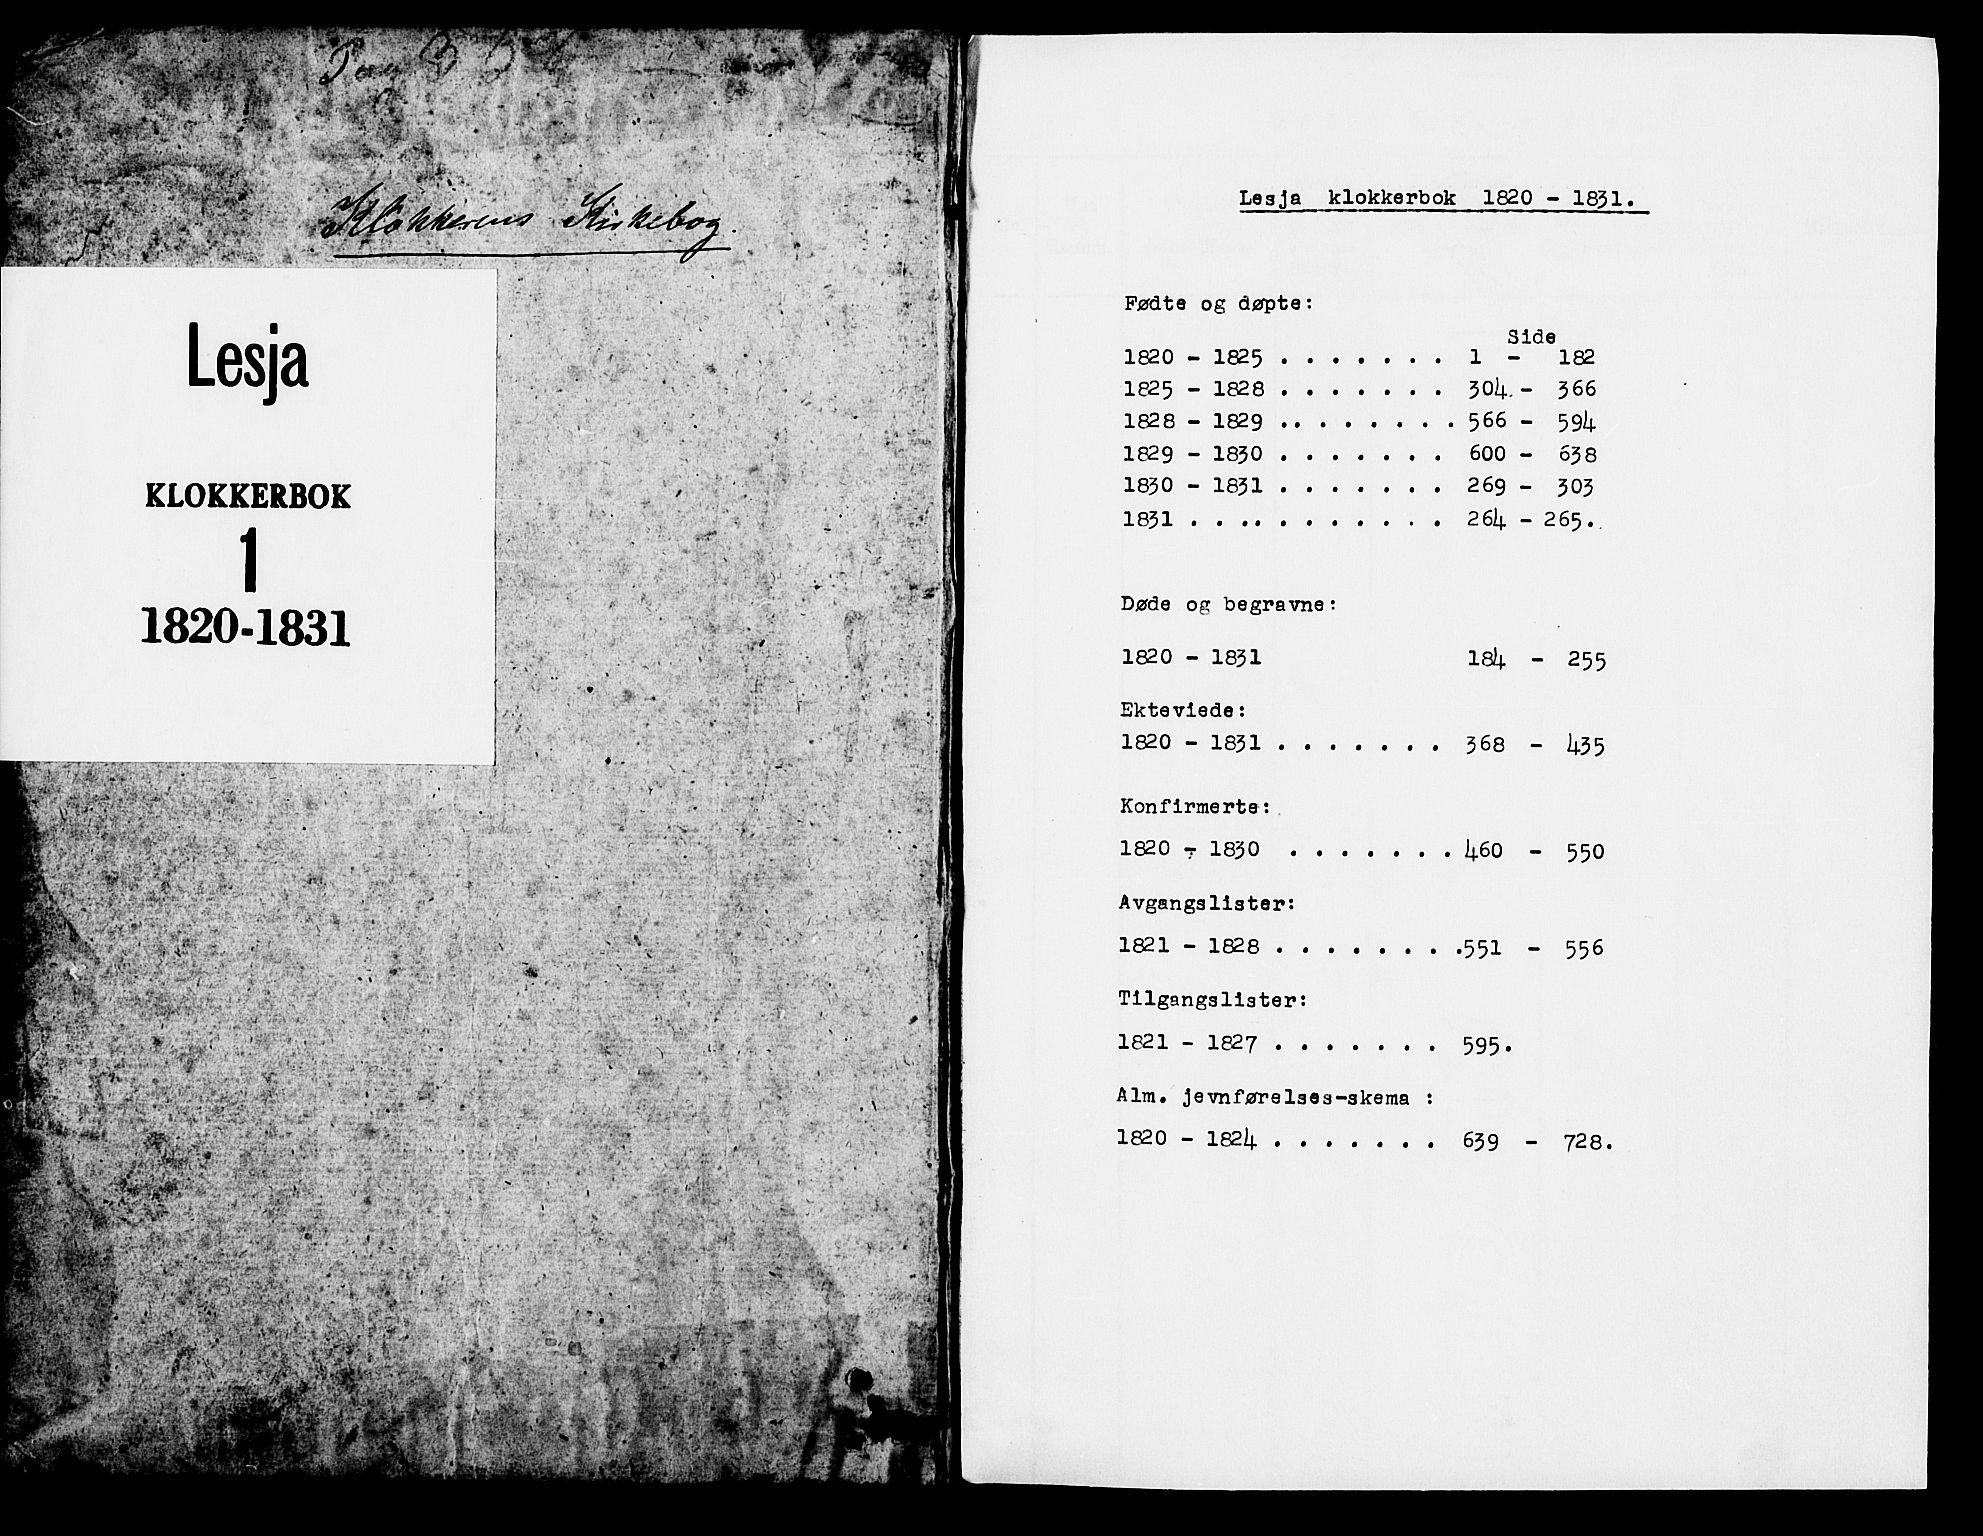 SAH, Lesja prestekontor, Klokkerbok nr. 1, 1820-1831